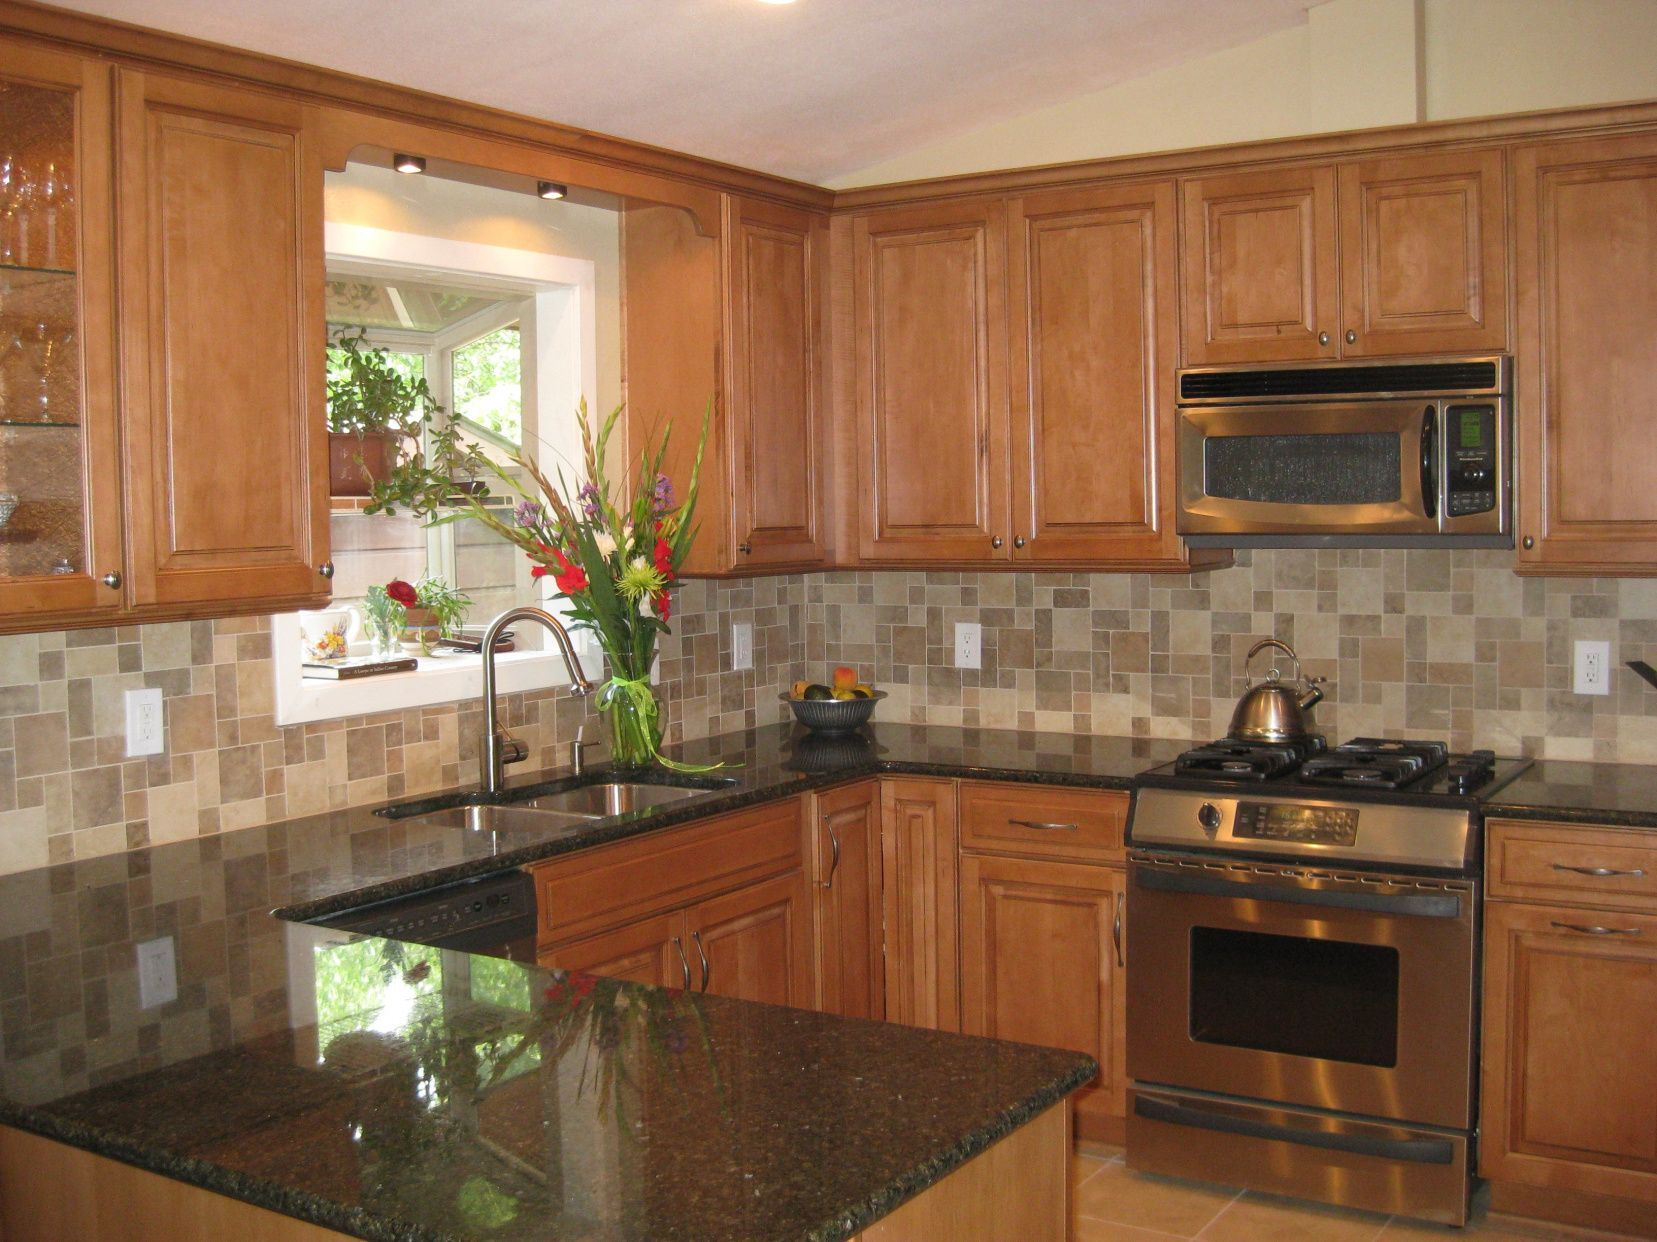 50+ Backsplash Ideas for Black Granite Countertops and ... on Backsplash Ideas For Maple Cabinets  id=38386